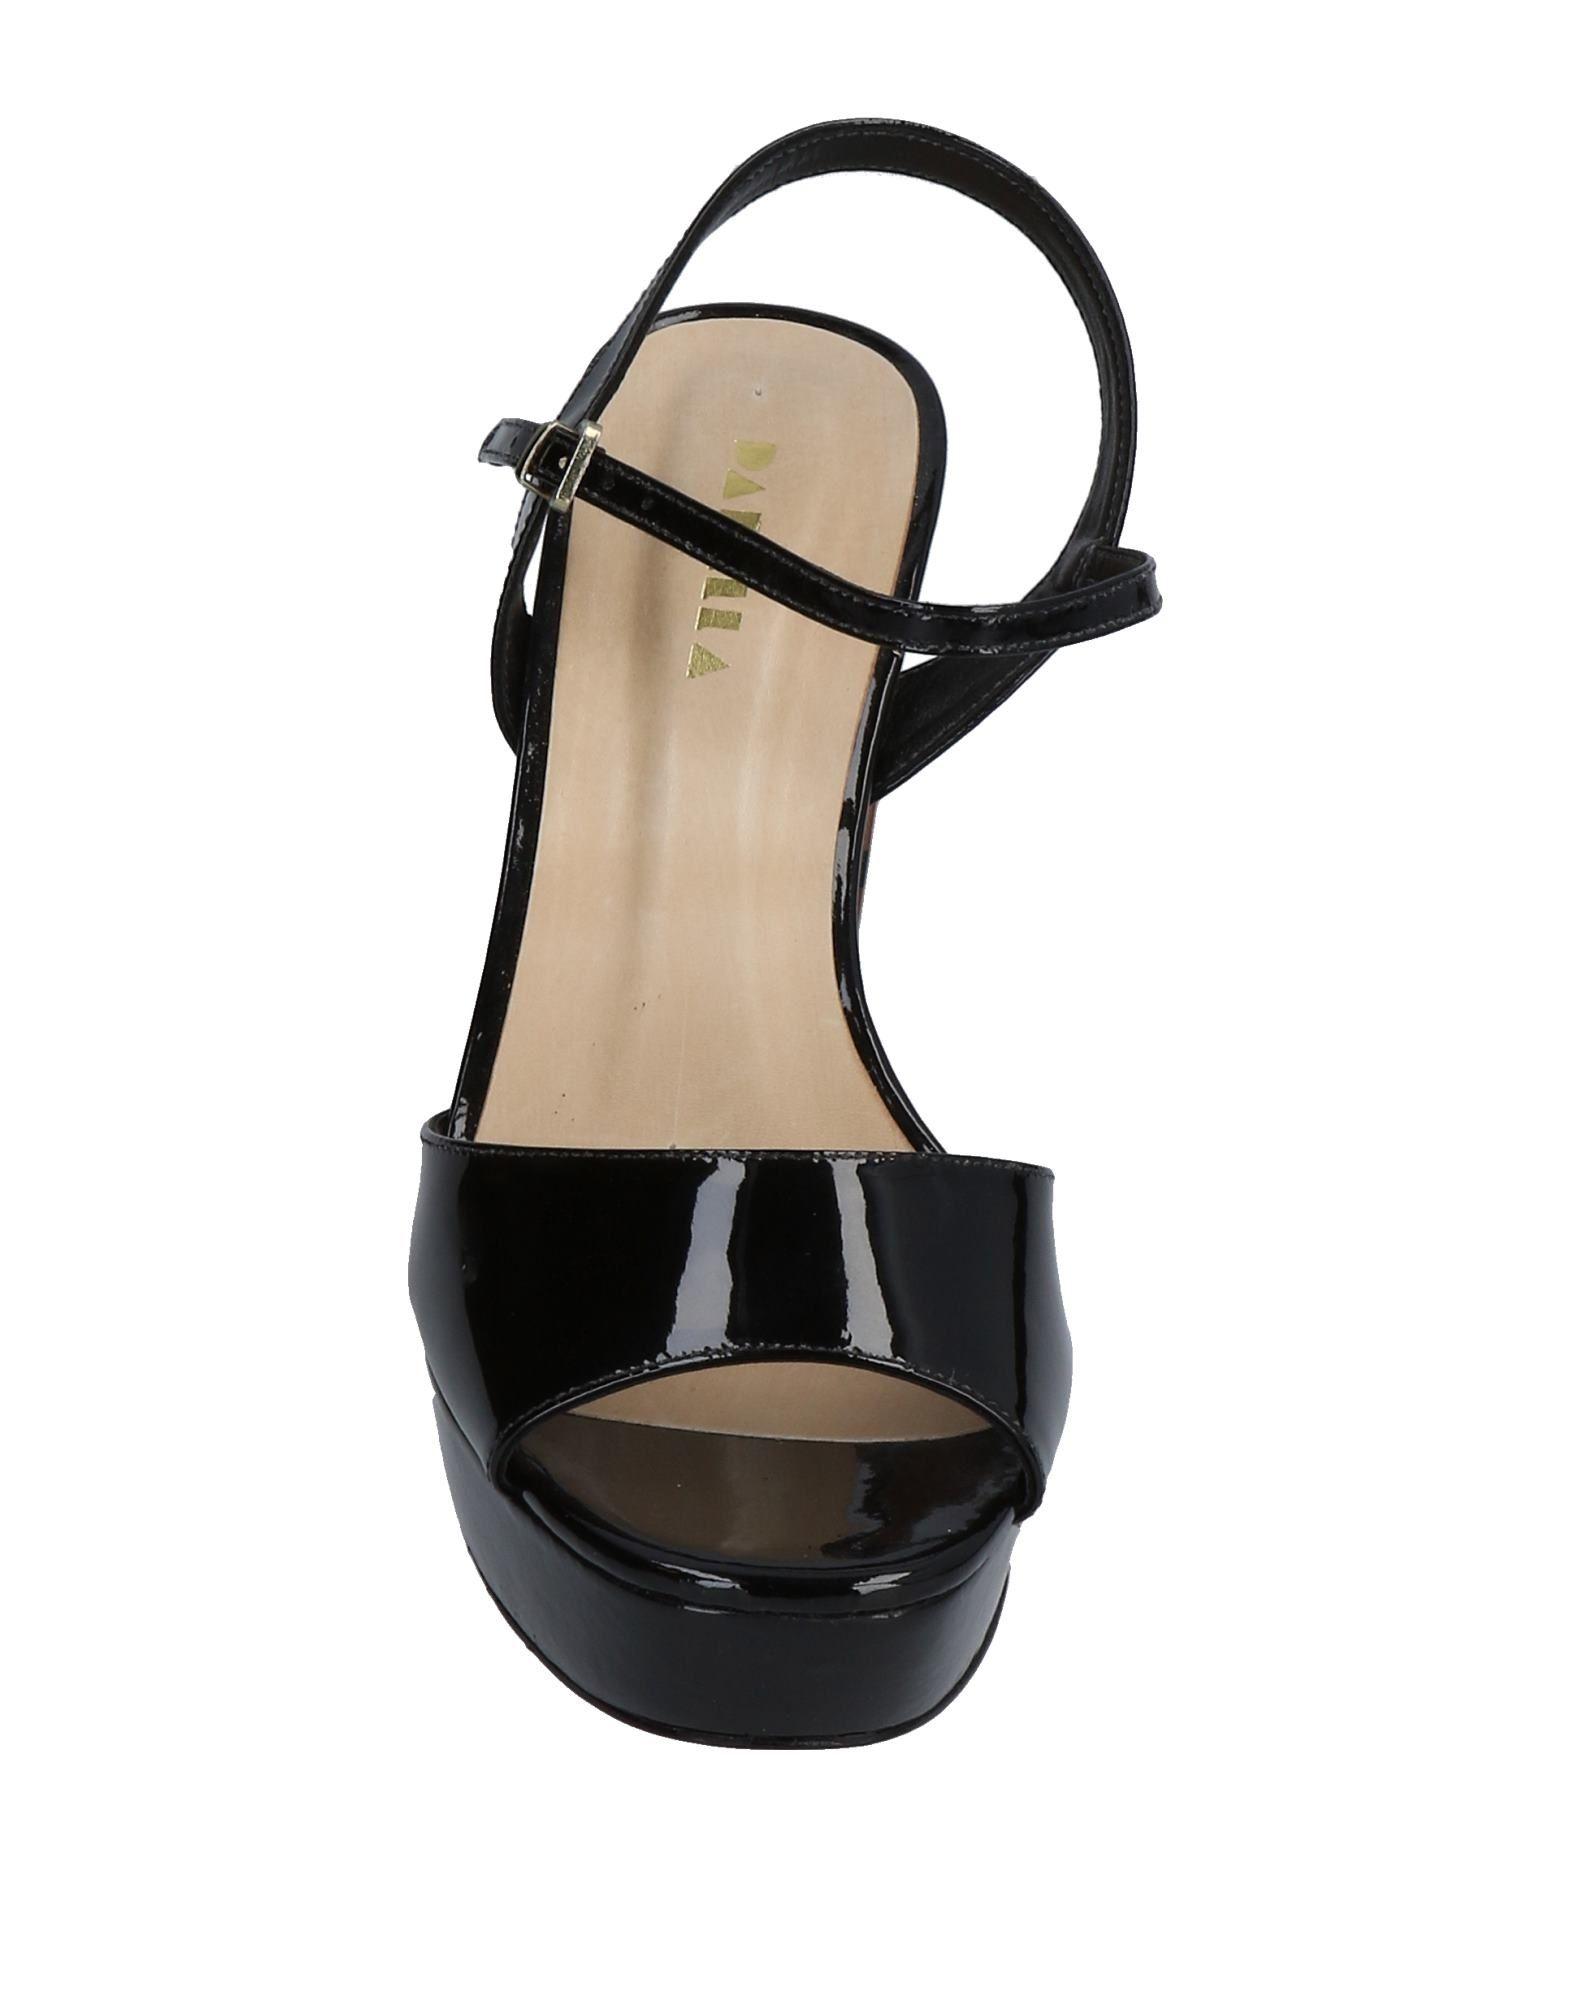 Panella Sandalen Damen  beliebte 11474314BA Gute Qualität beliebte  Schuhe 9333b2